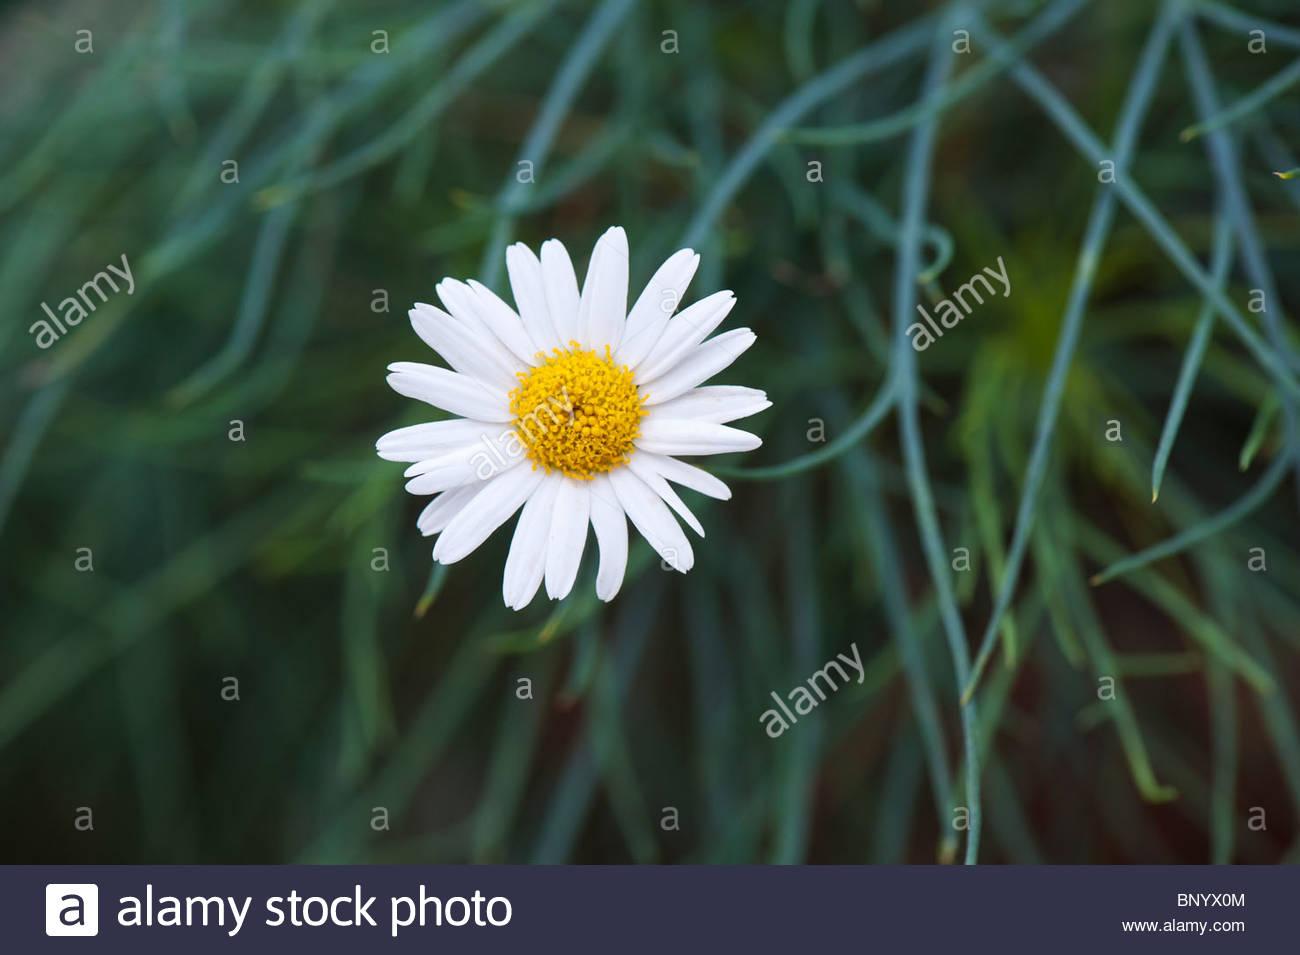 Evergreen daisies stock photos evergreen daisies stock images alamy argyranthemum gracile chelsea girl marguerite flower stock image izmirmasajfo